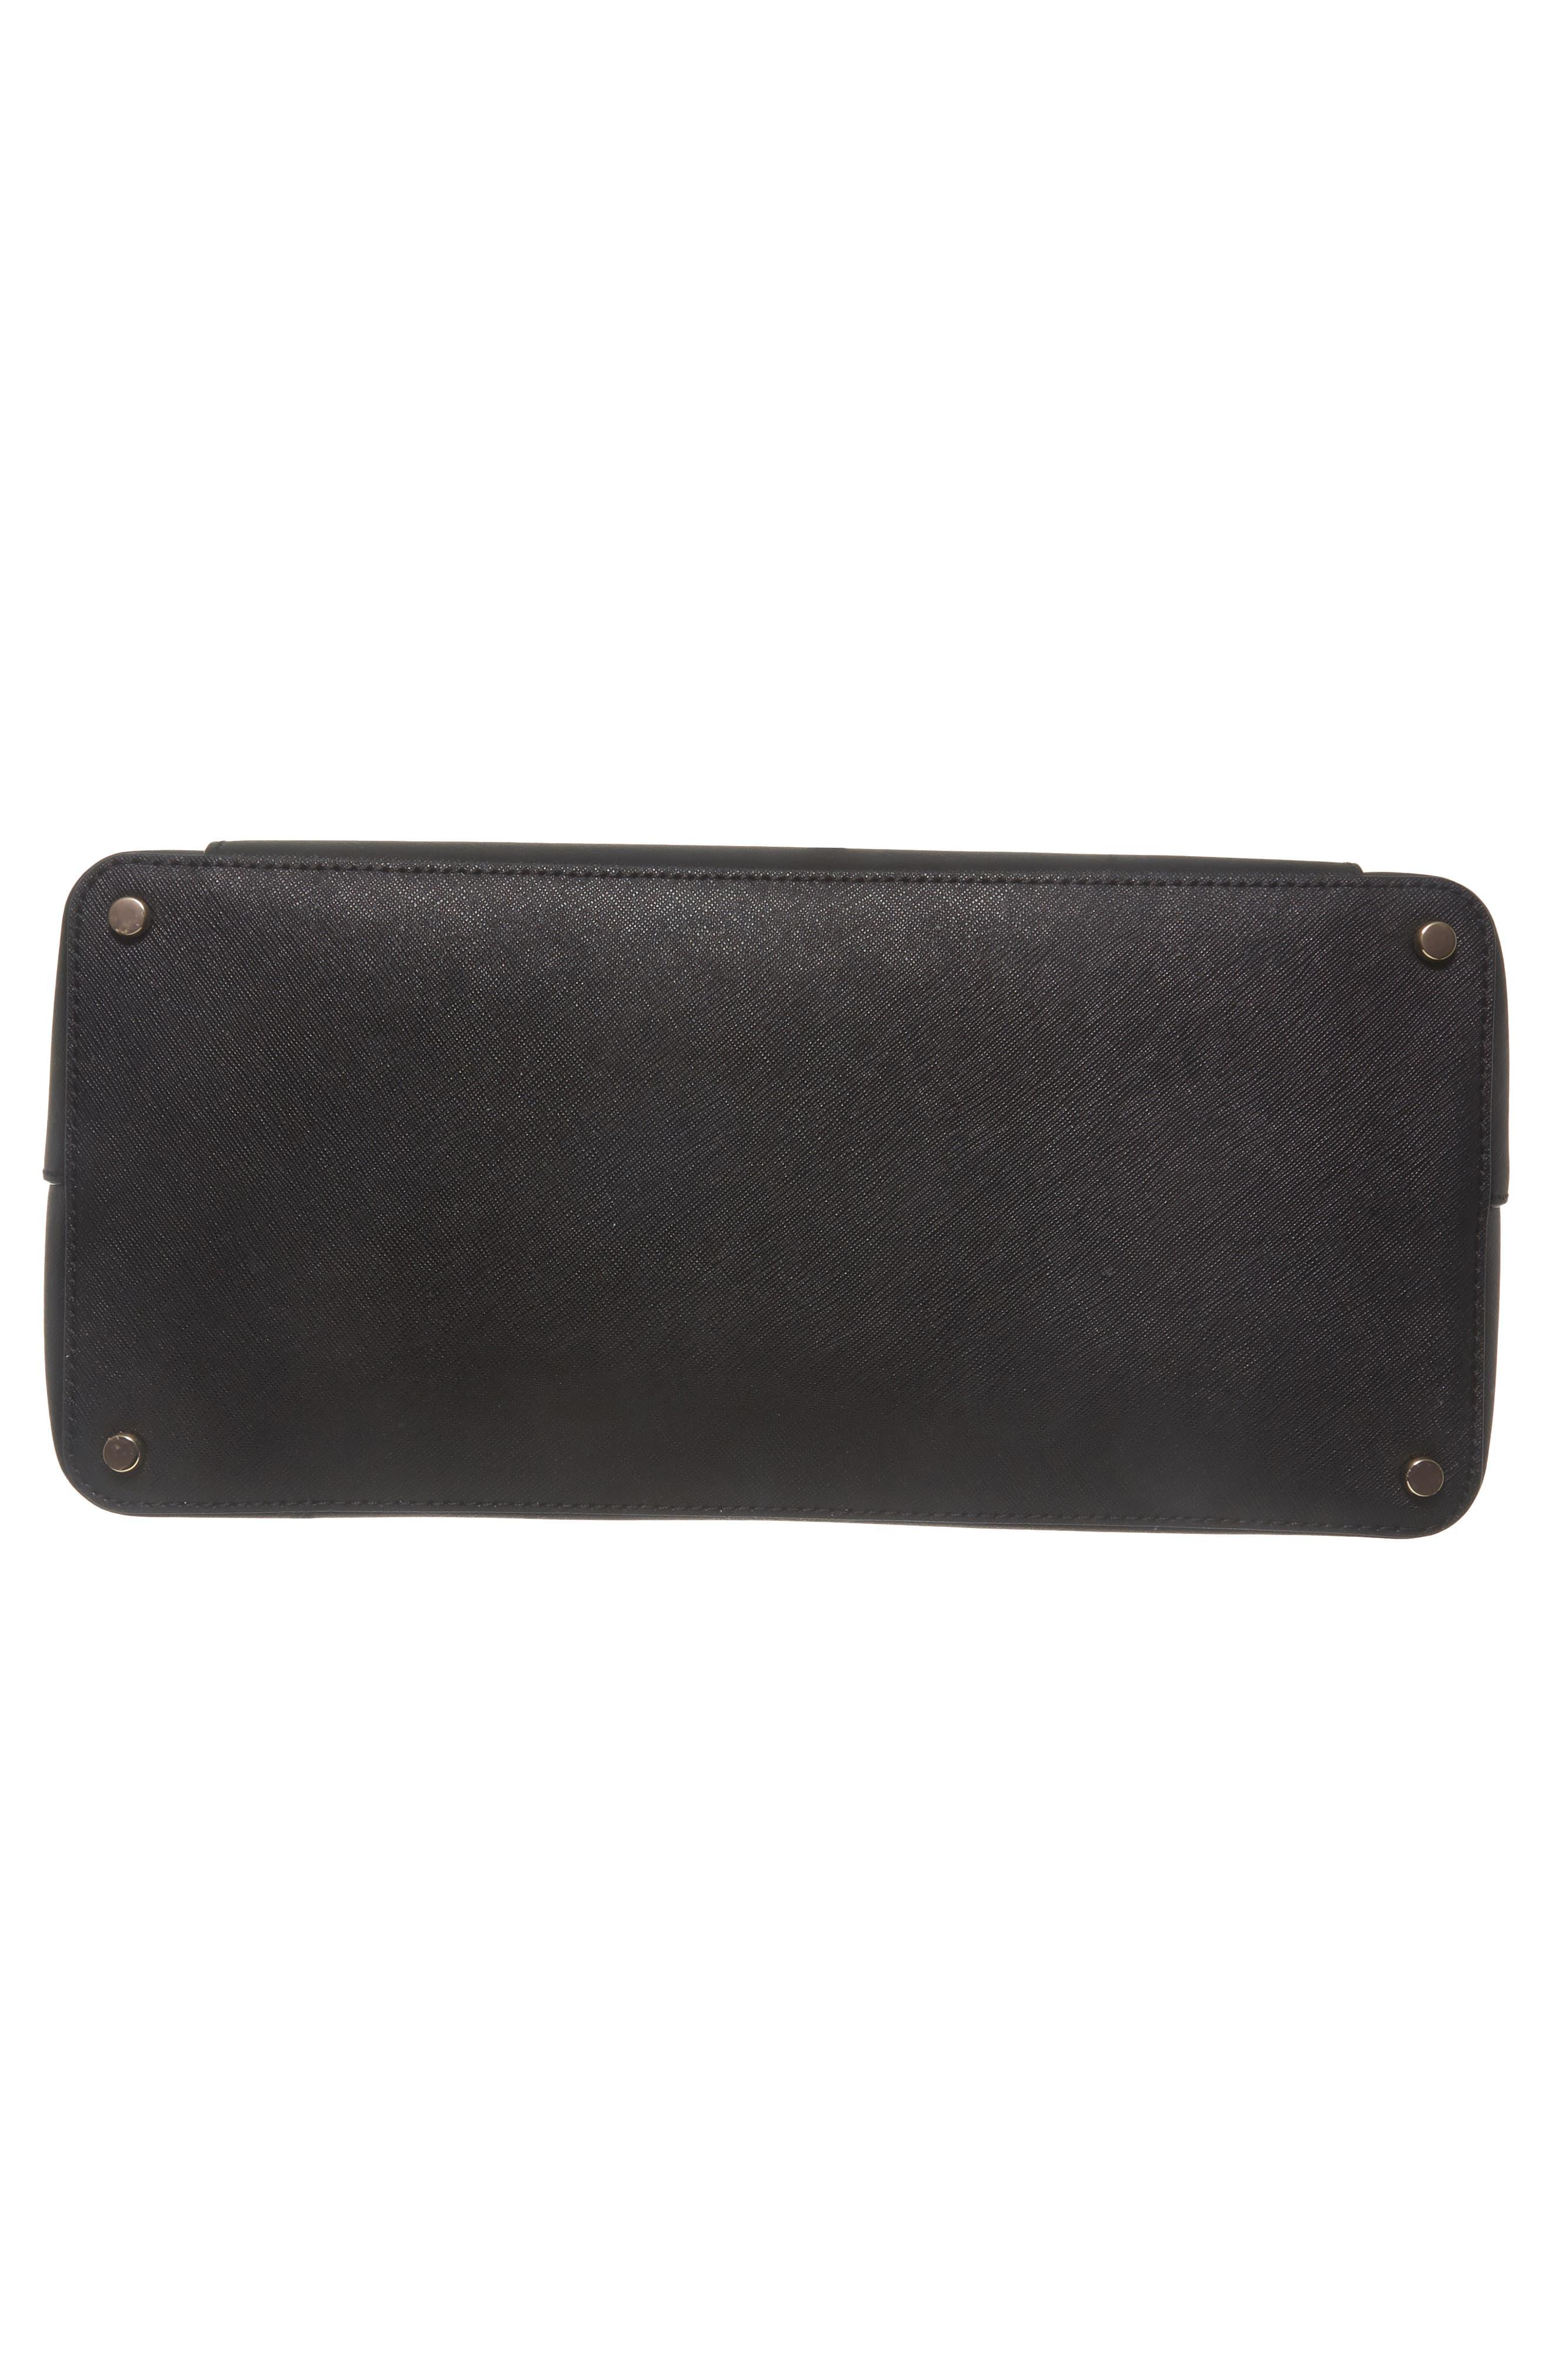 cameron street – audrey leather laptop tote,                             Alternate thumbnail 6, color,                             Black